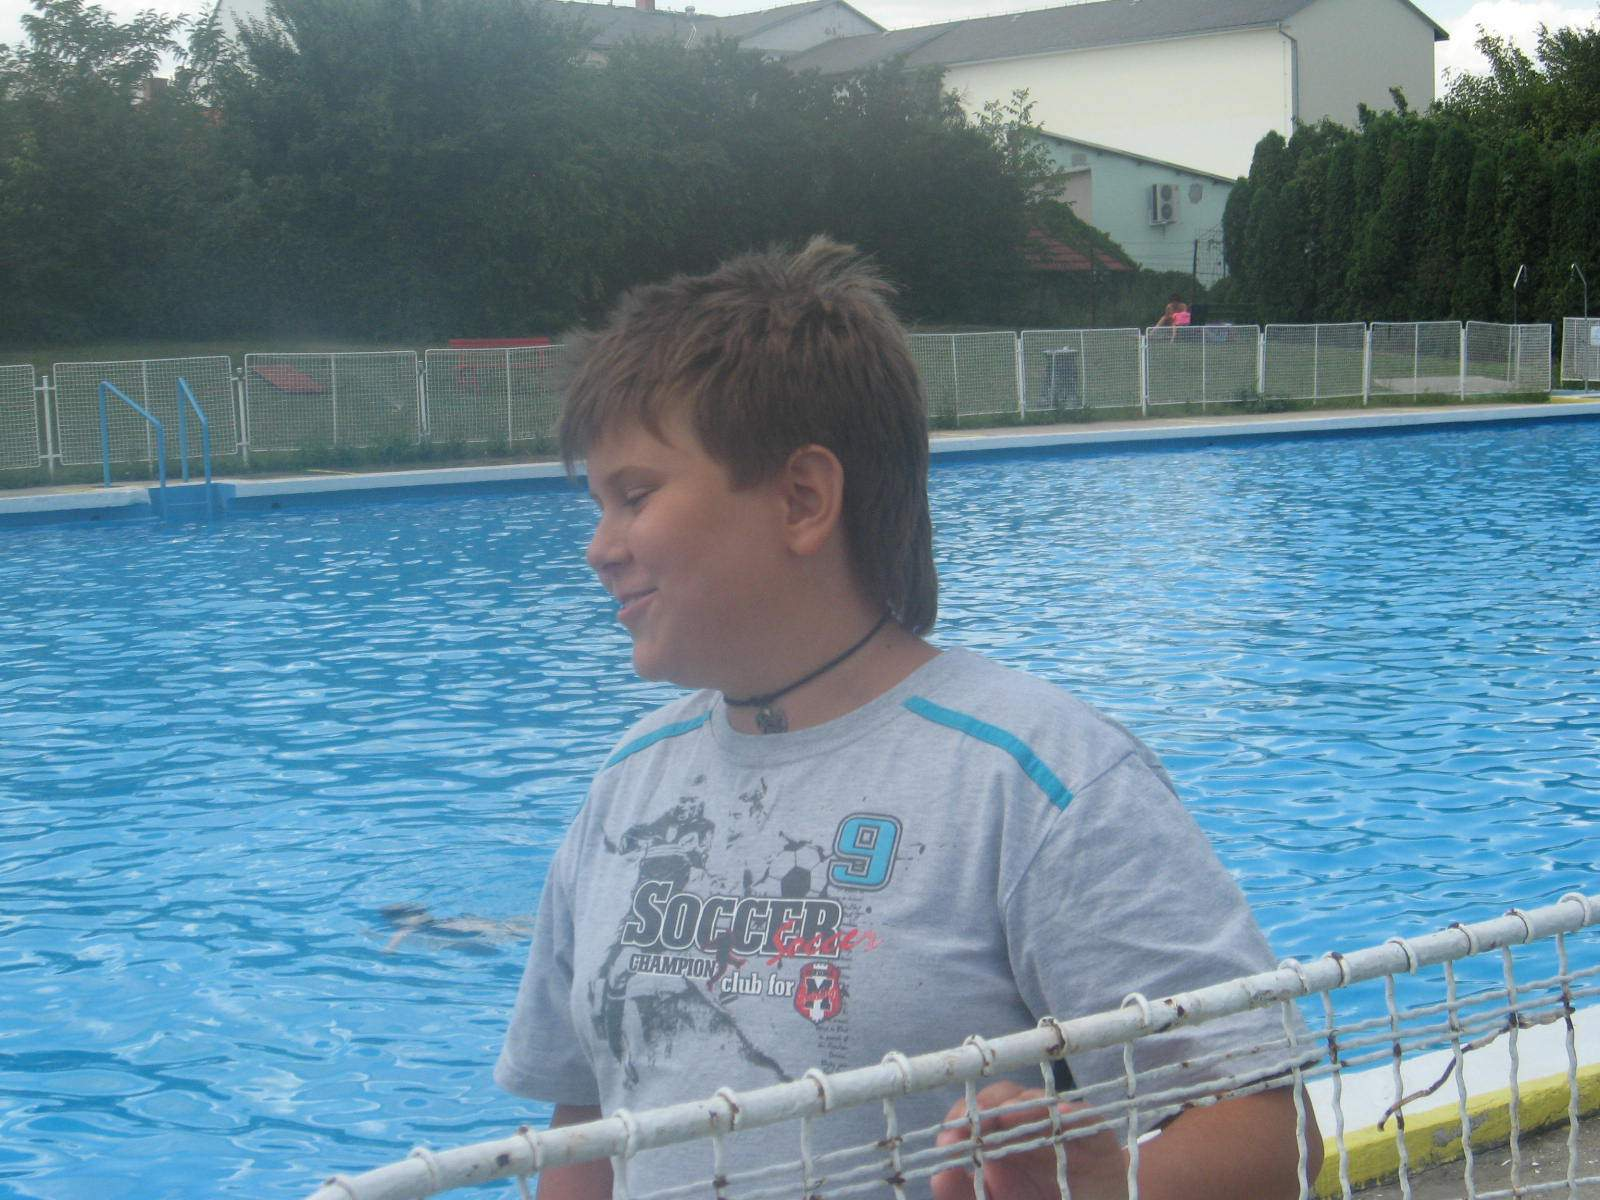 Summer Day Camp Iii August 15th Ic Swimming Pool Kyjov Camp2013 Album Na Raj Eti